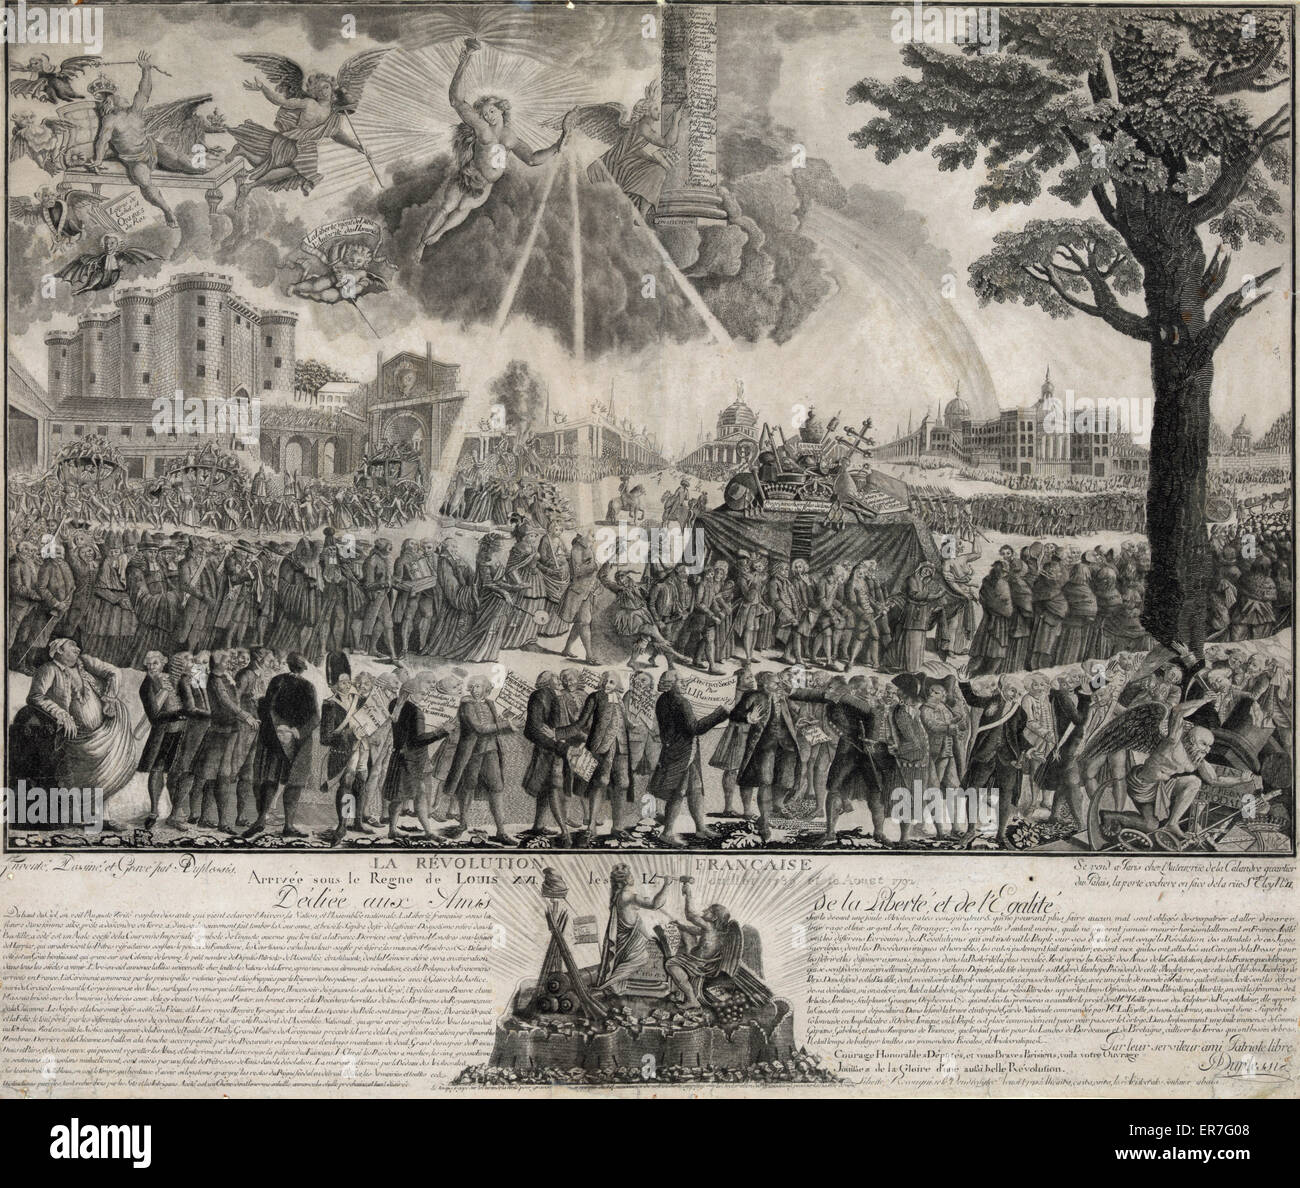 La Revolution Francaise - Stock Image